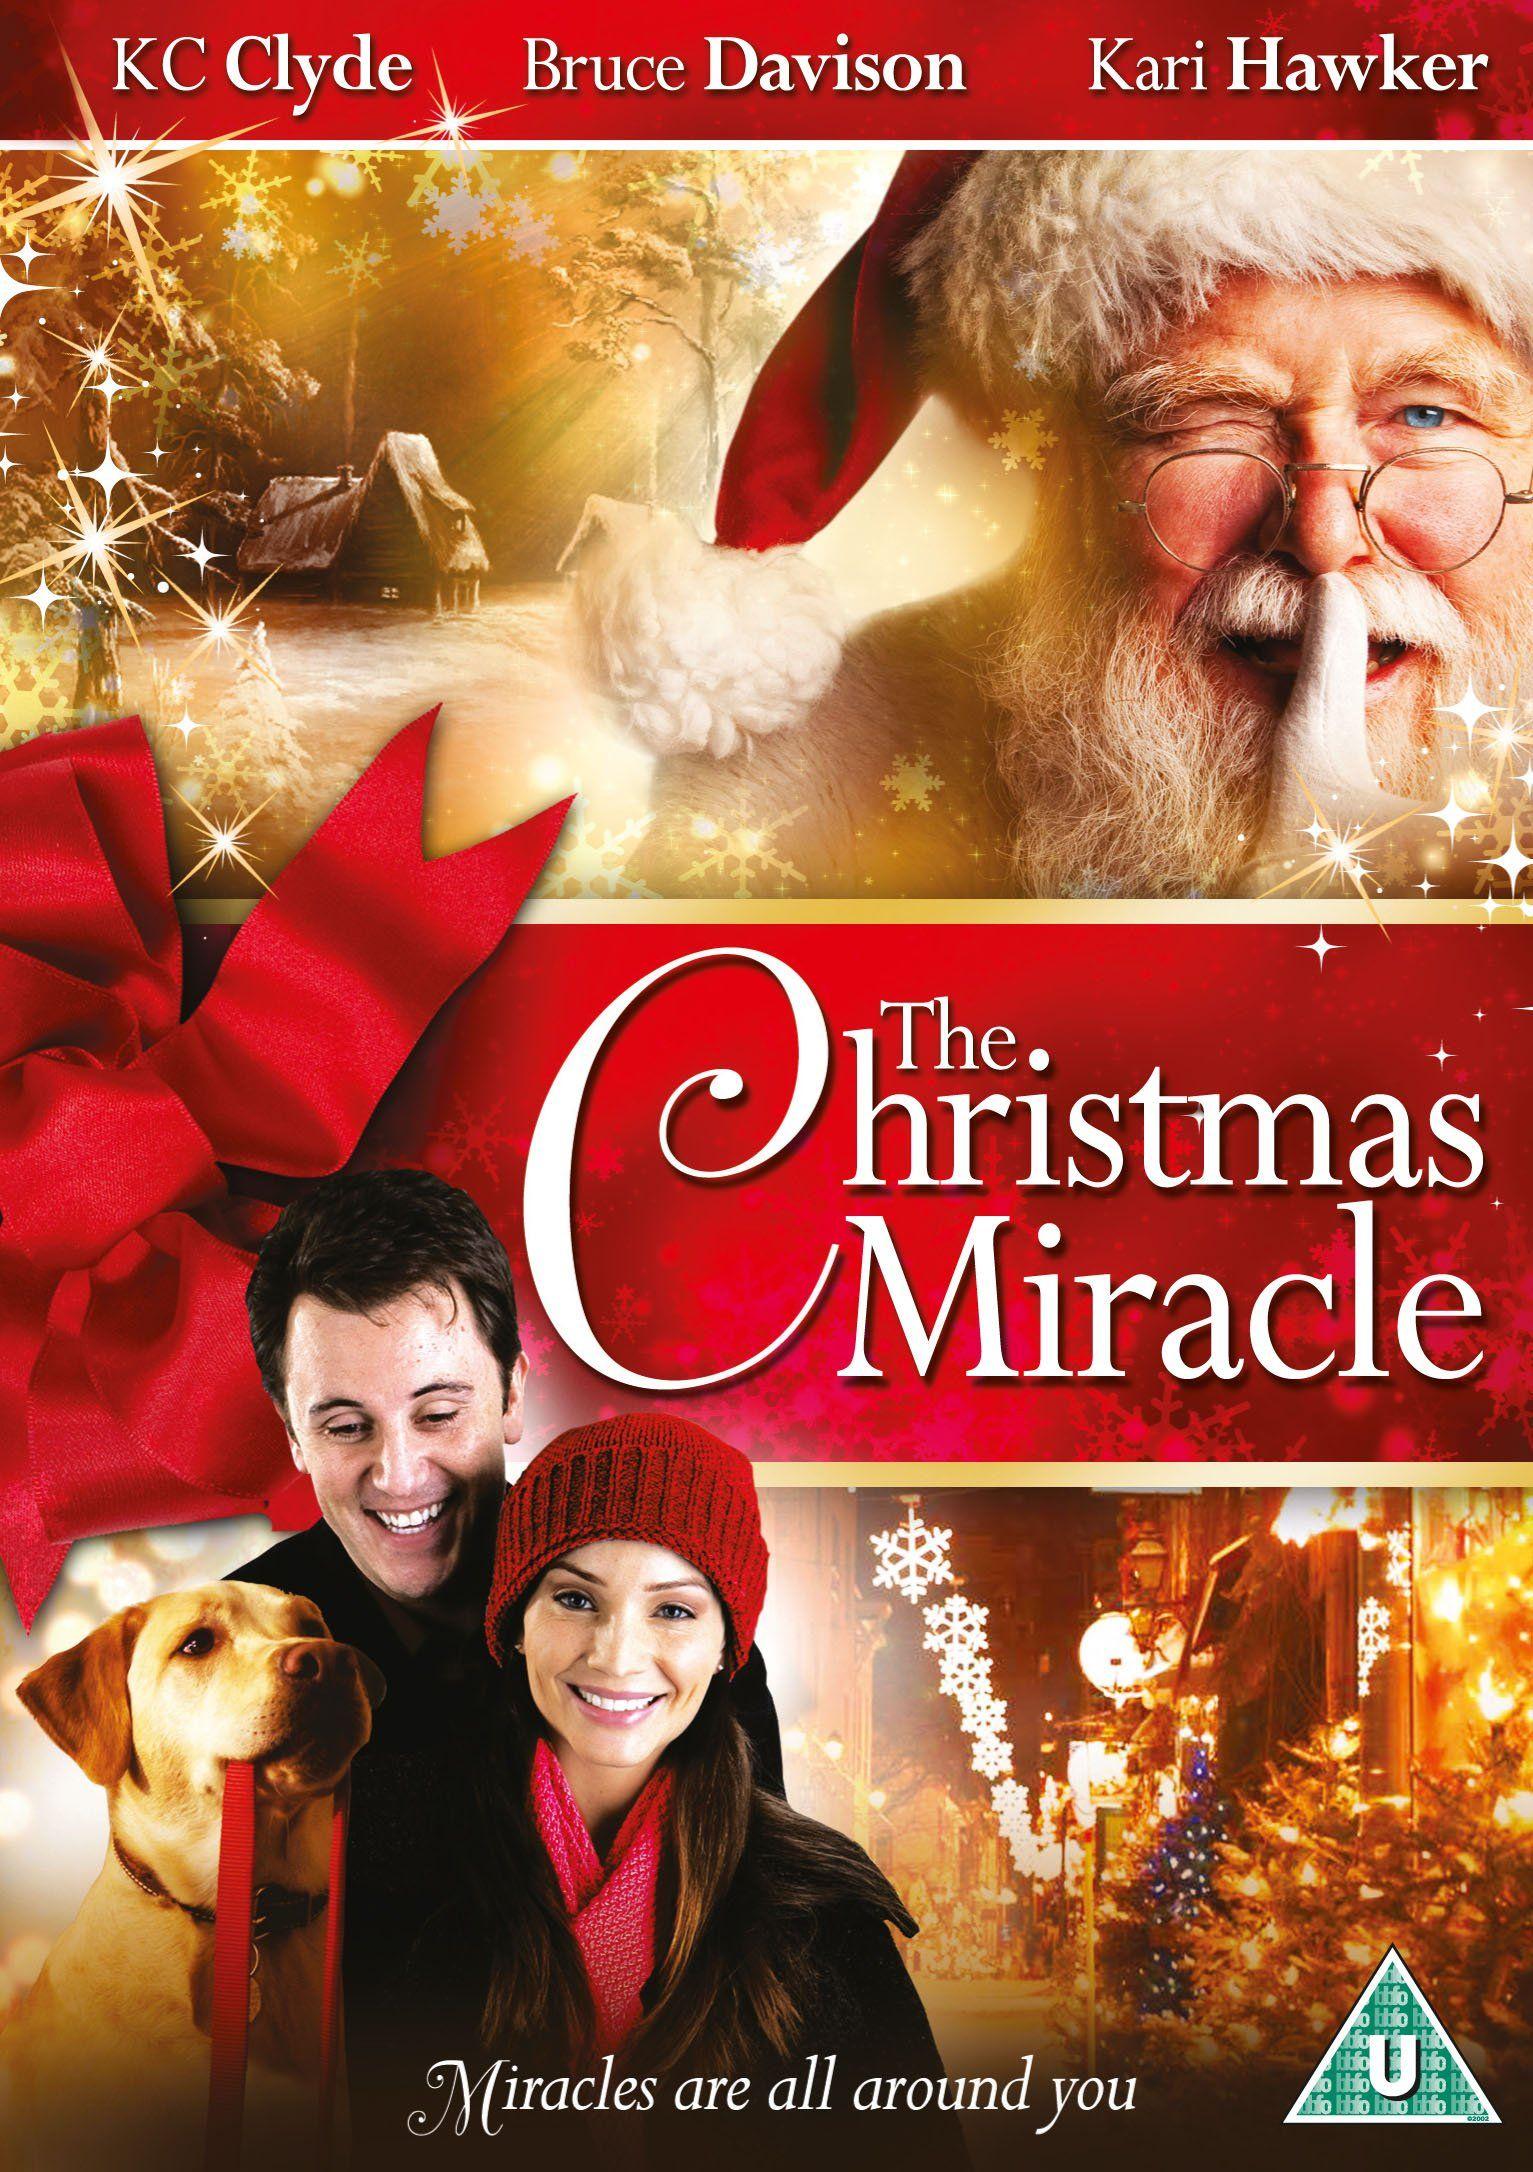 The Christmas Miracle Dvd Amazon Co Uk K C Clyde Kari Hawker Bruce Davison Mauree Hallmark Christmas Movies Best Christmas Movies Christmas Movies List